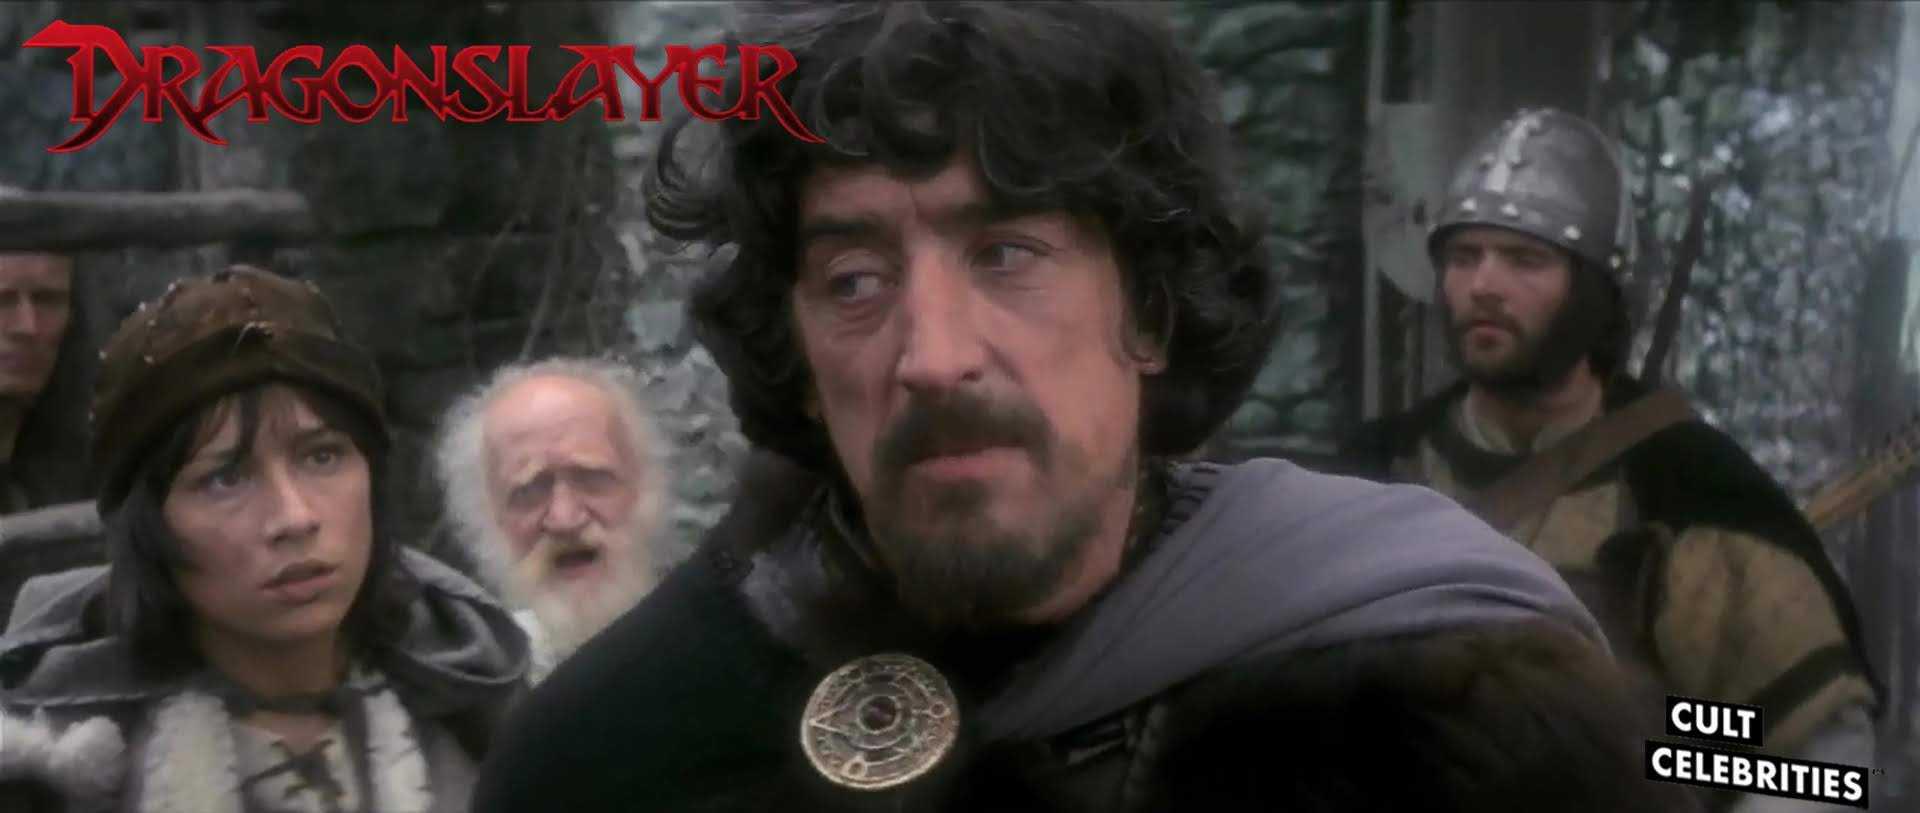 John Hallam in Dragonslayer (1981)